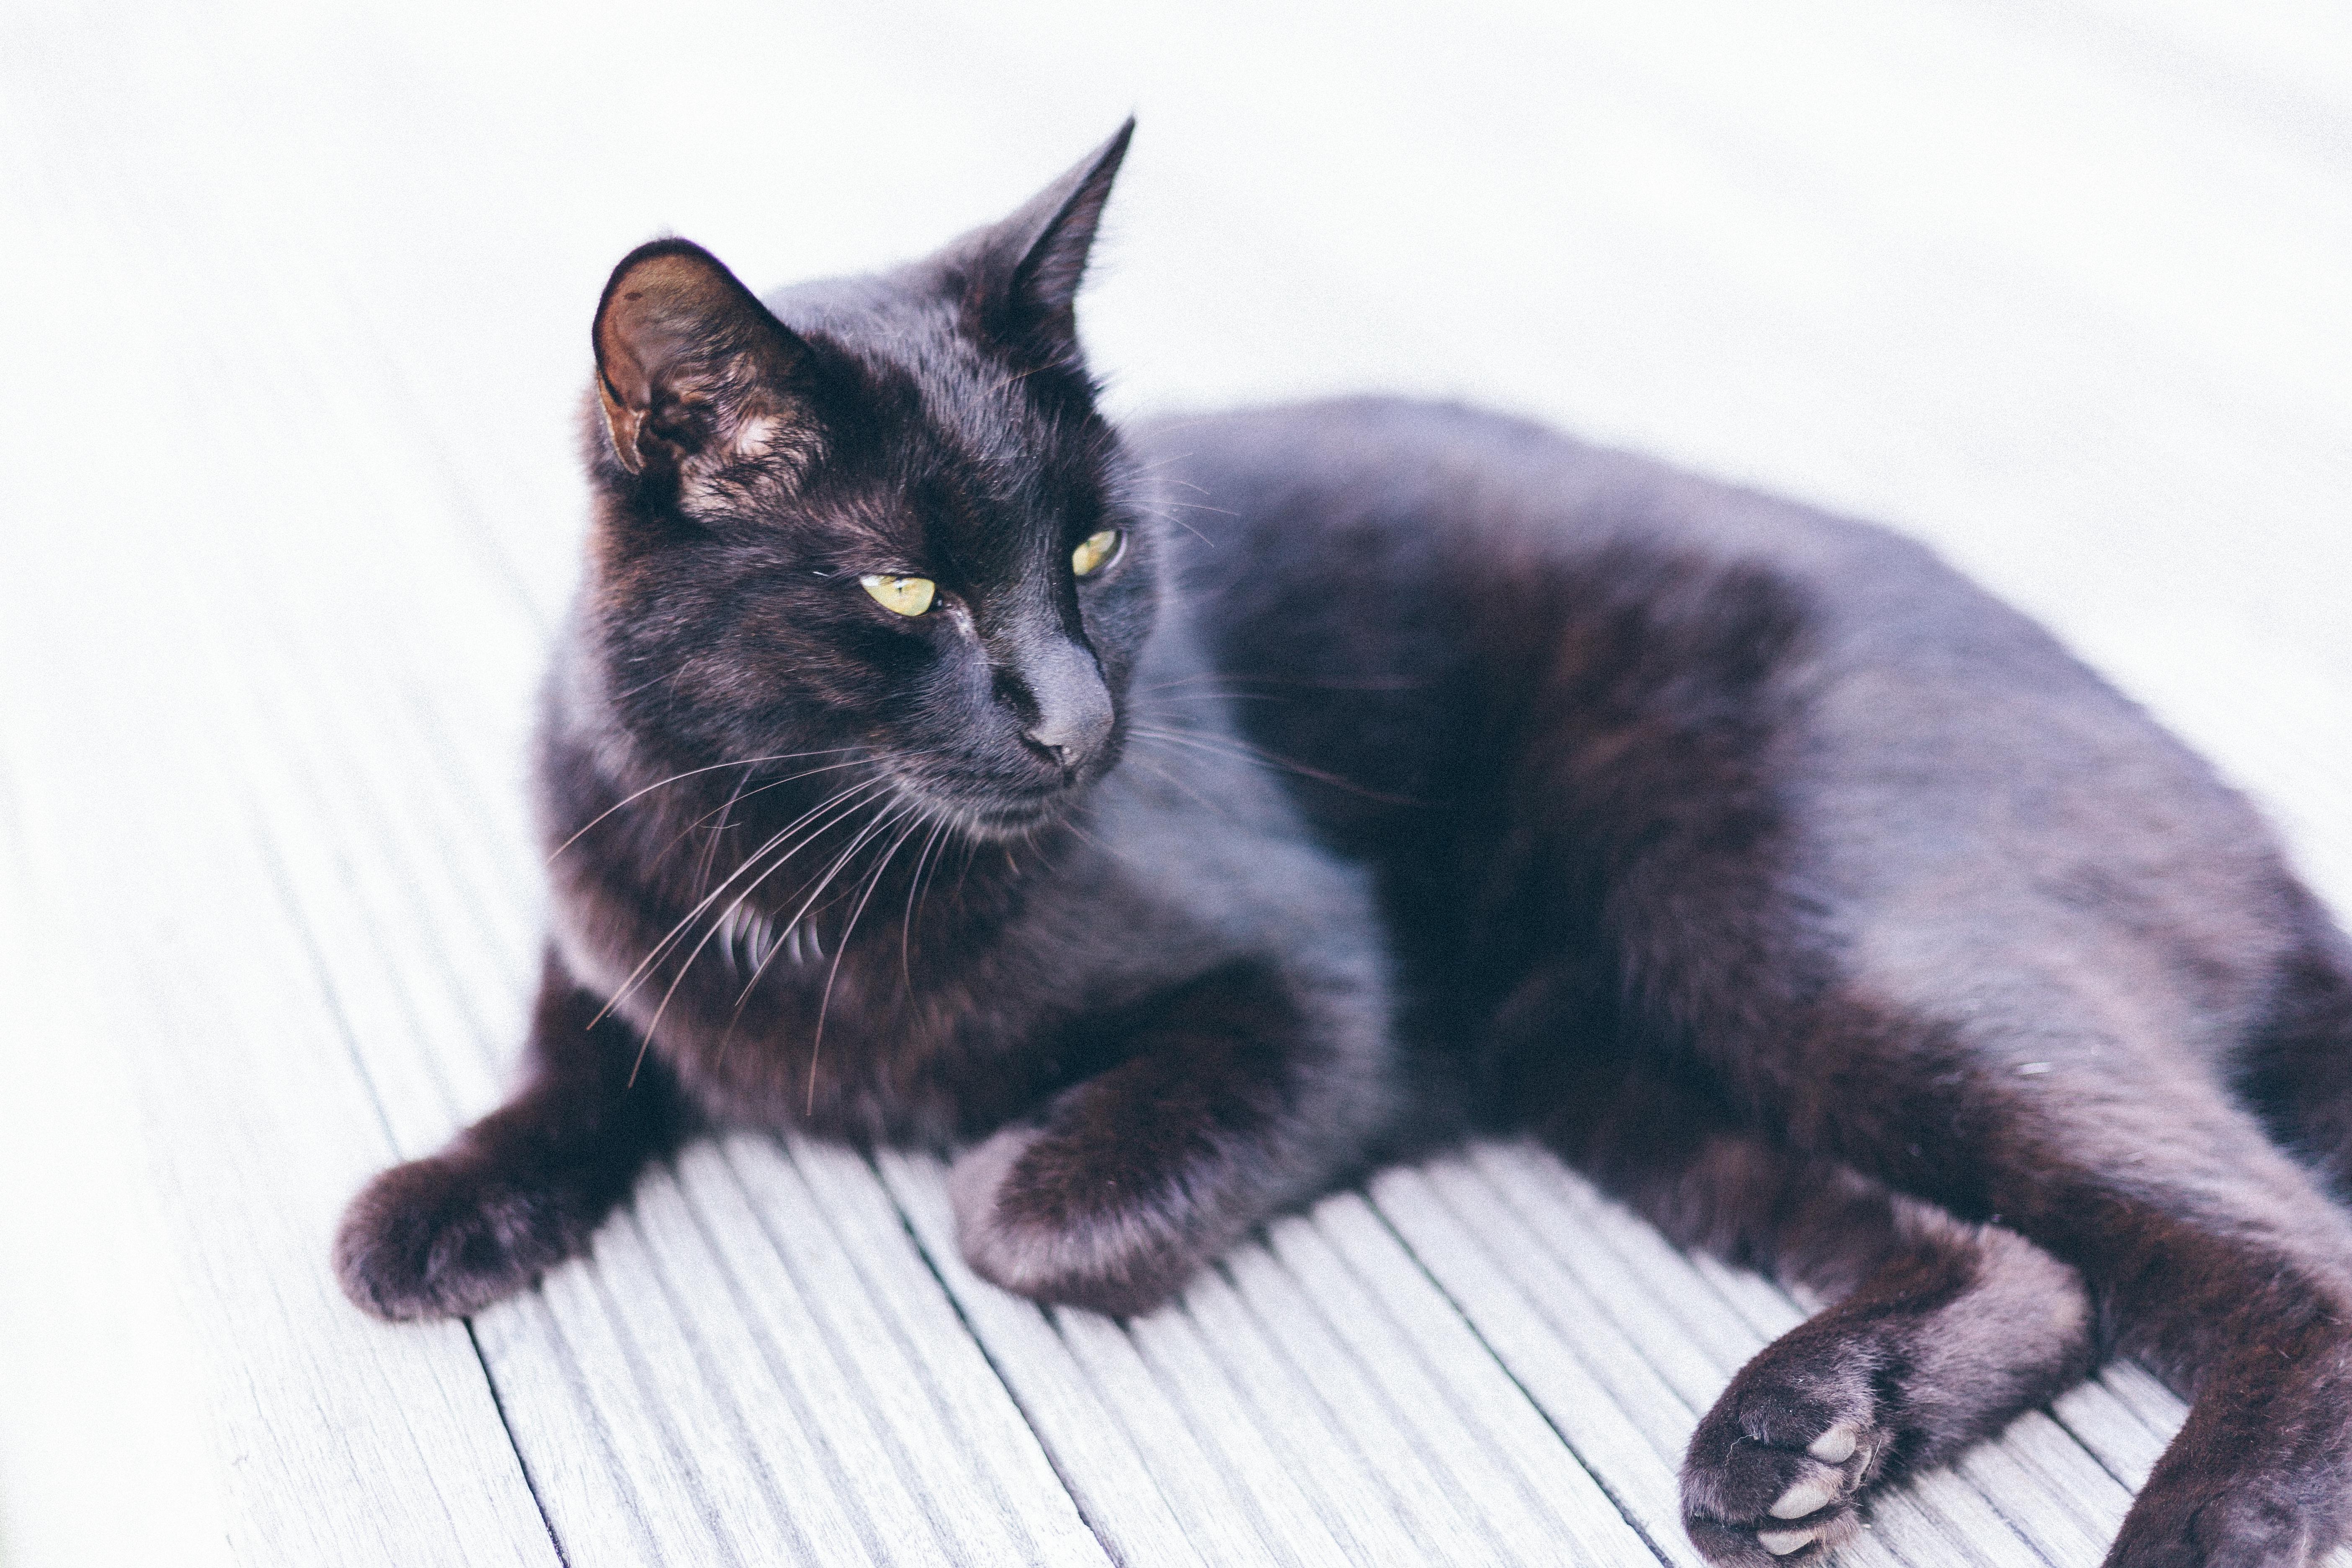 Black Cat on the Deck, Cat, Green, Pet, HQ Photo